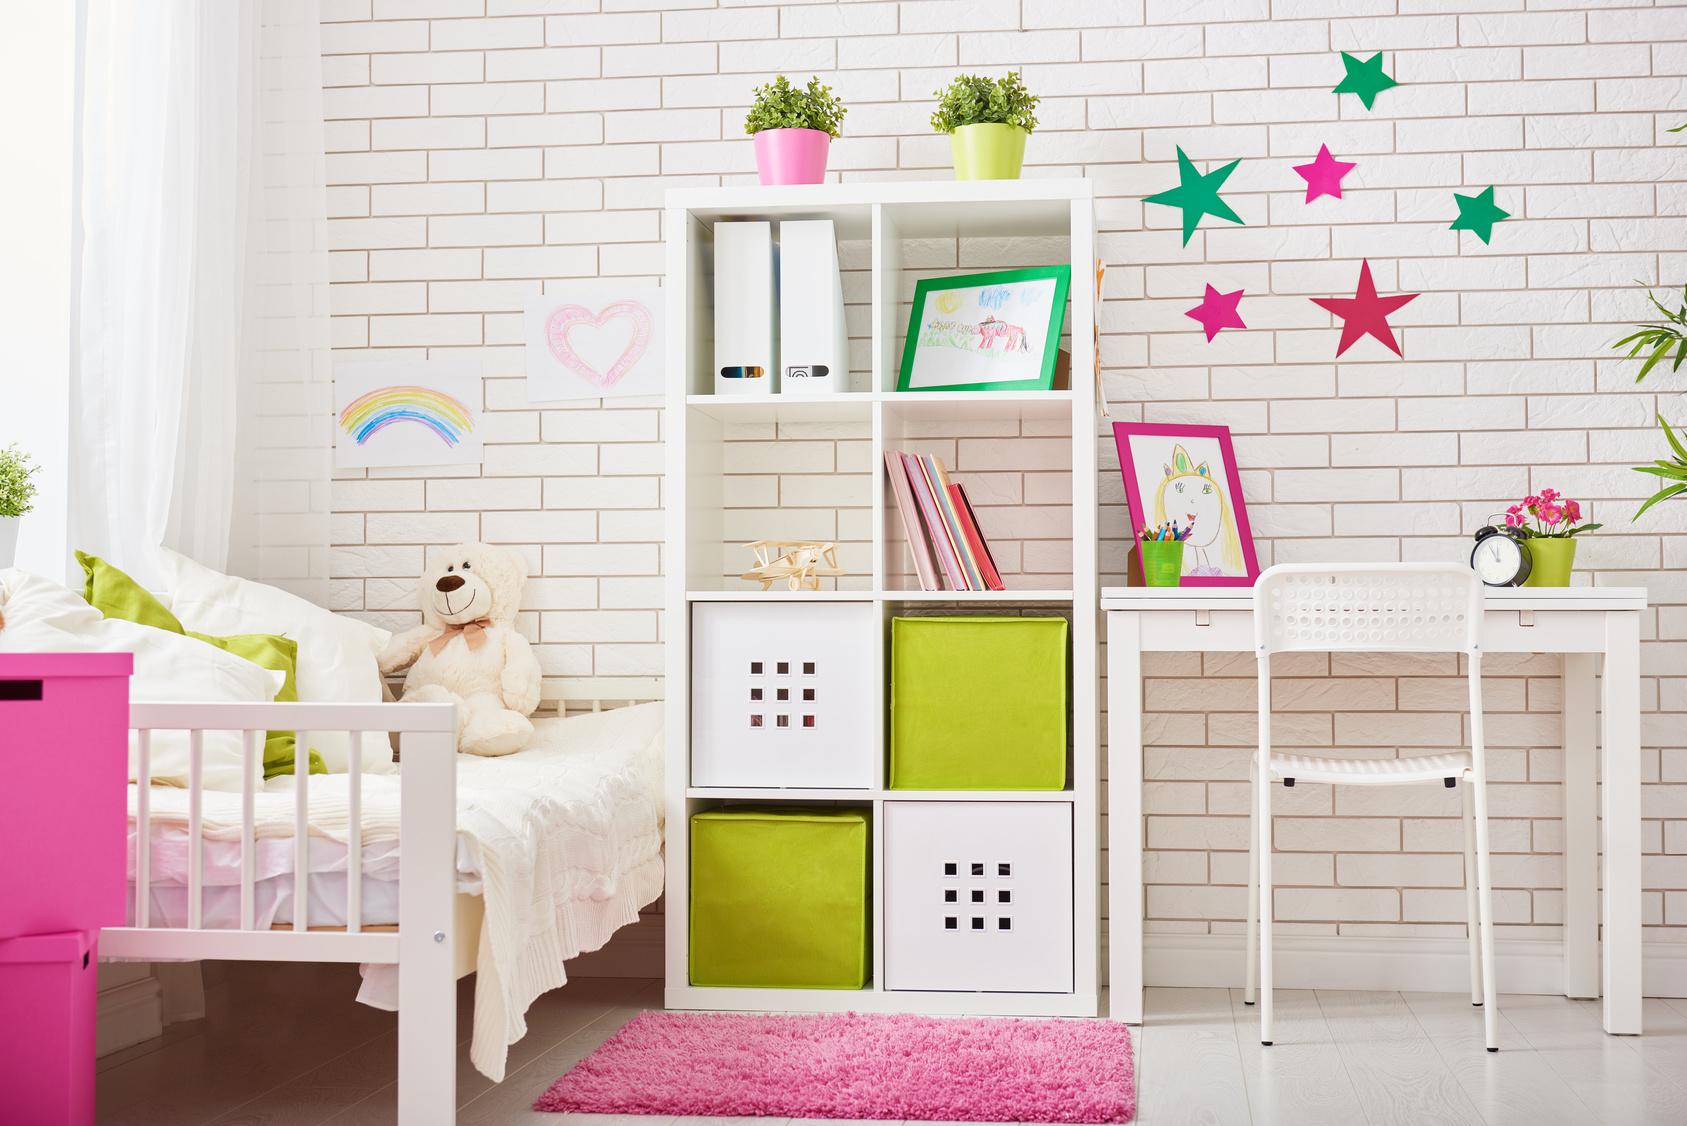 Bedroom decoration idea 5.jpg